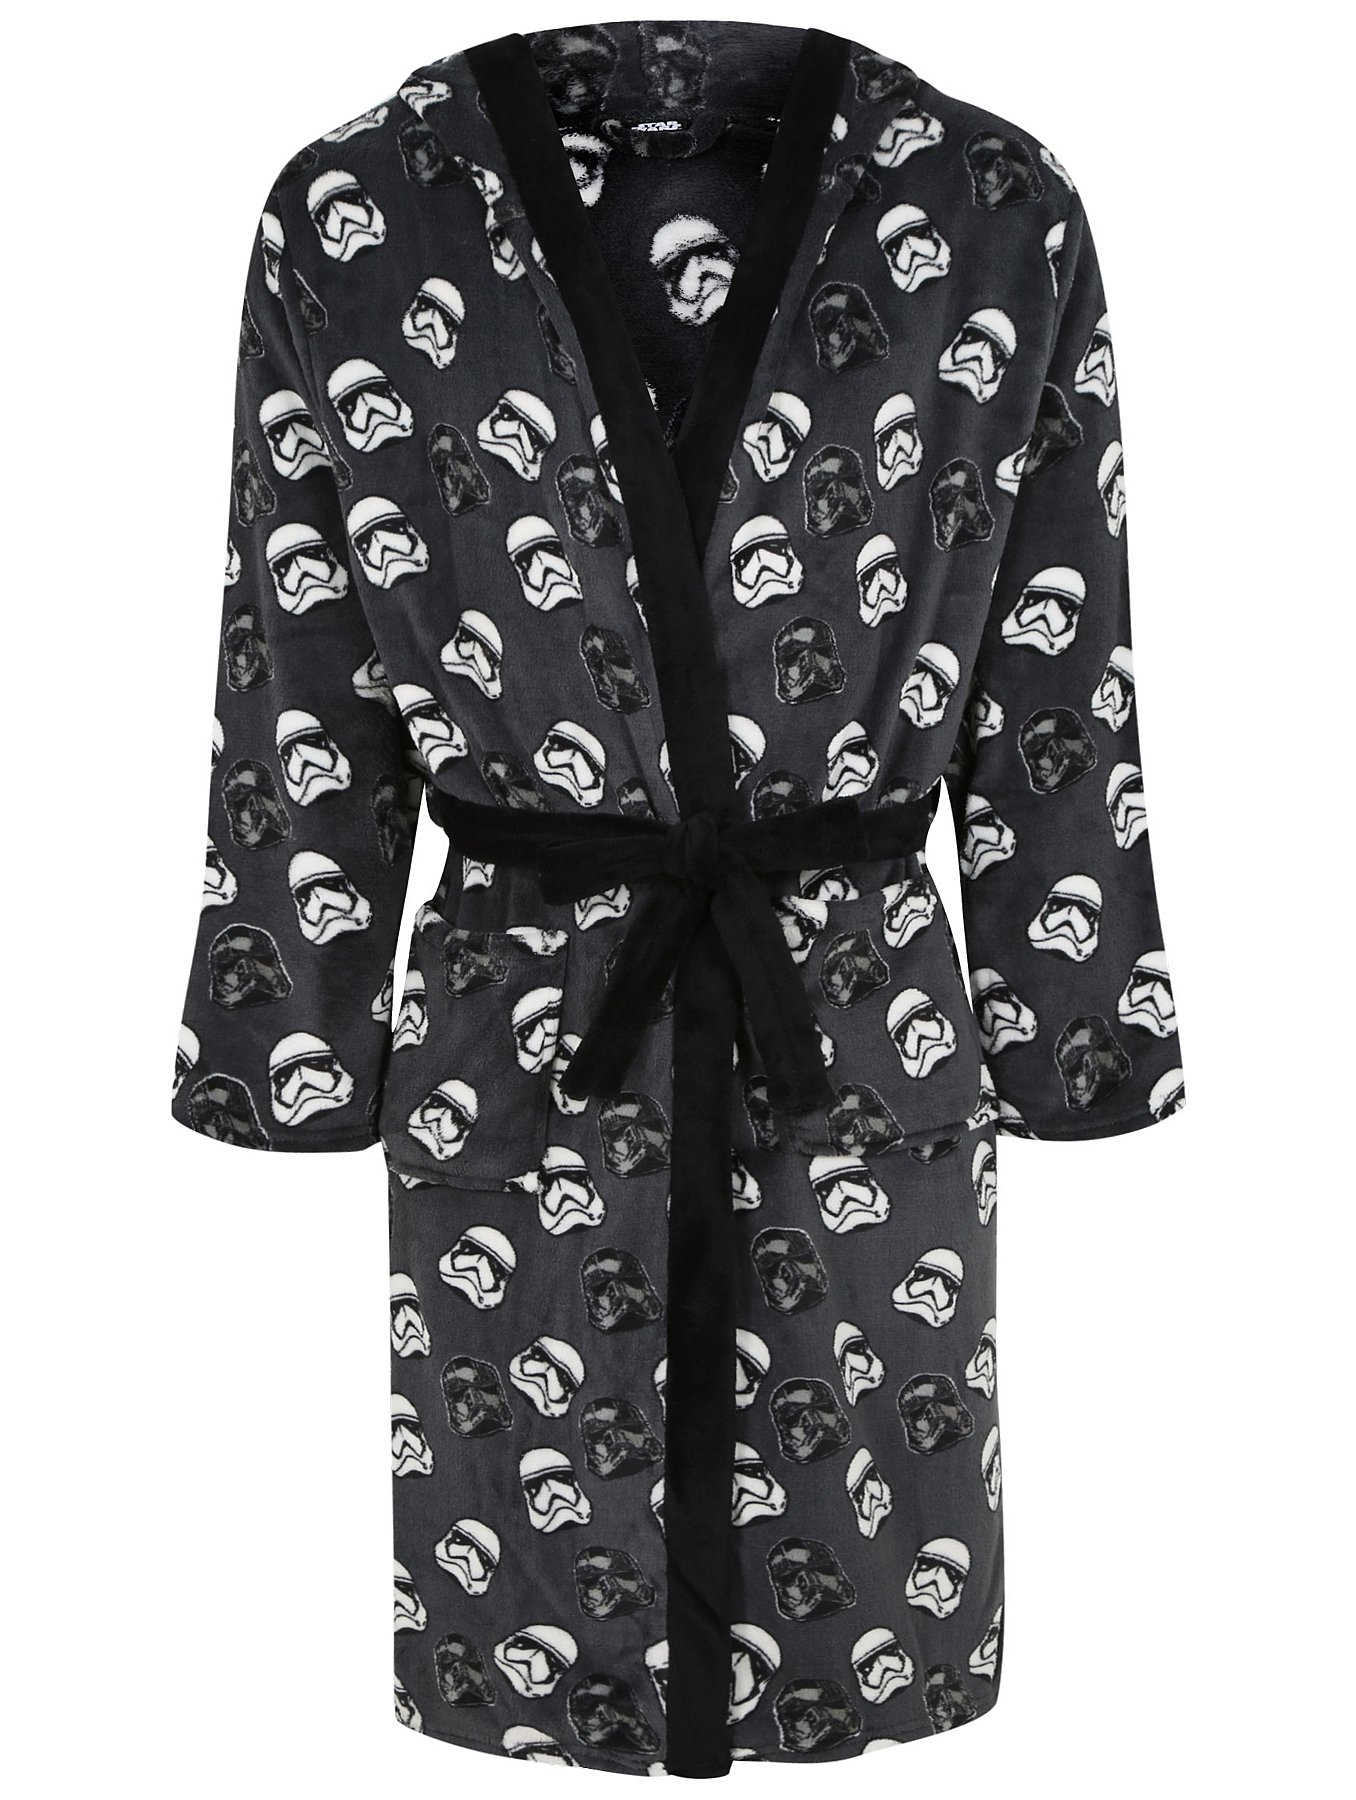 Star Wars Hooded Fleece Dressing Gown | Men | George